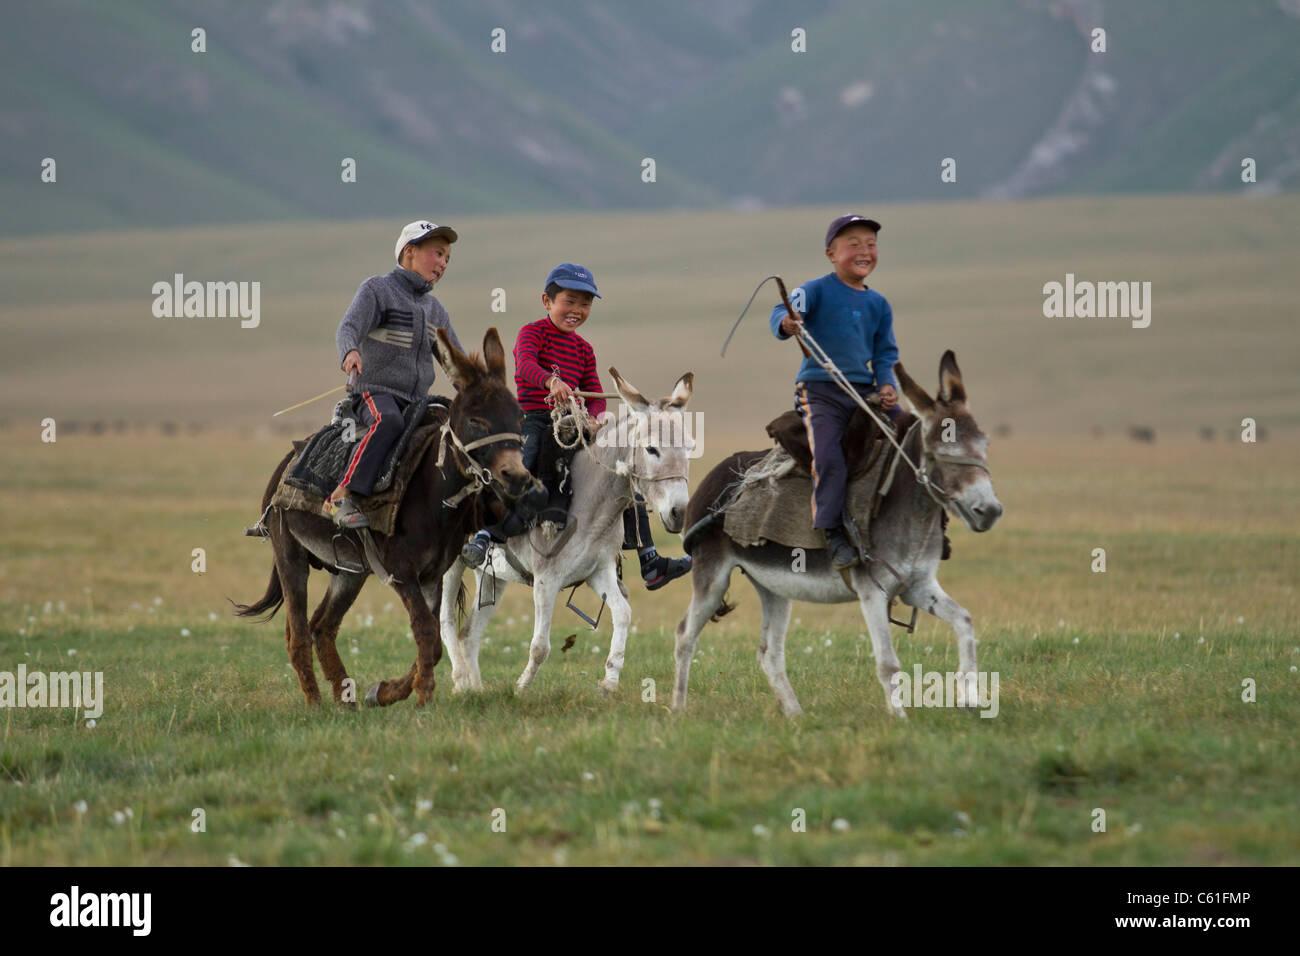 Three children riding on a donkeys, Kyrgyzstan - Stock Image